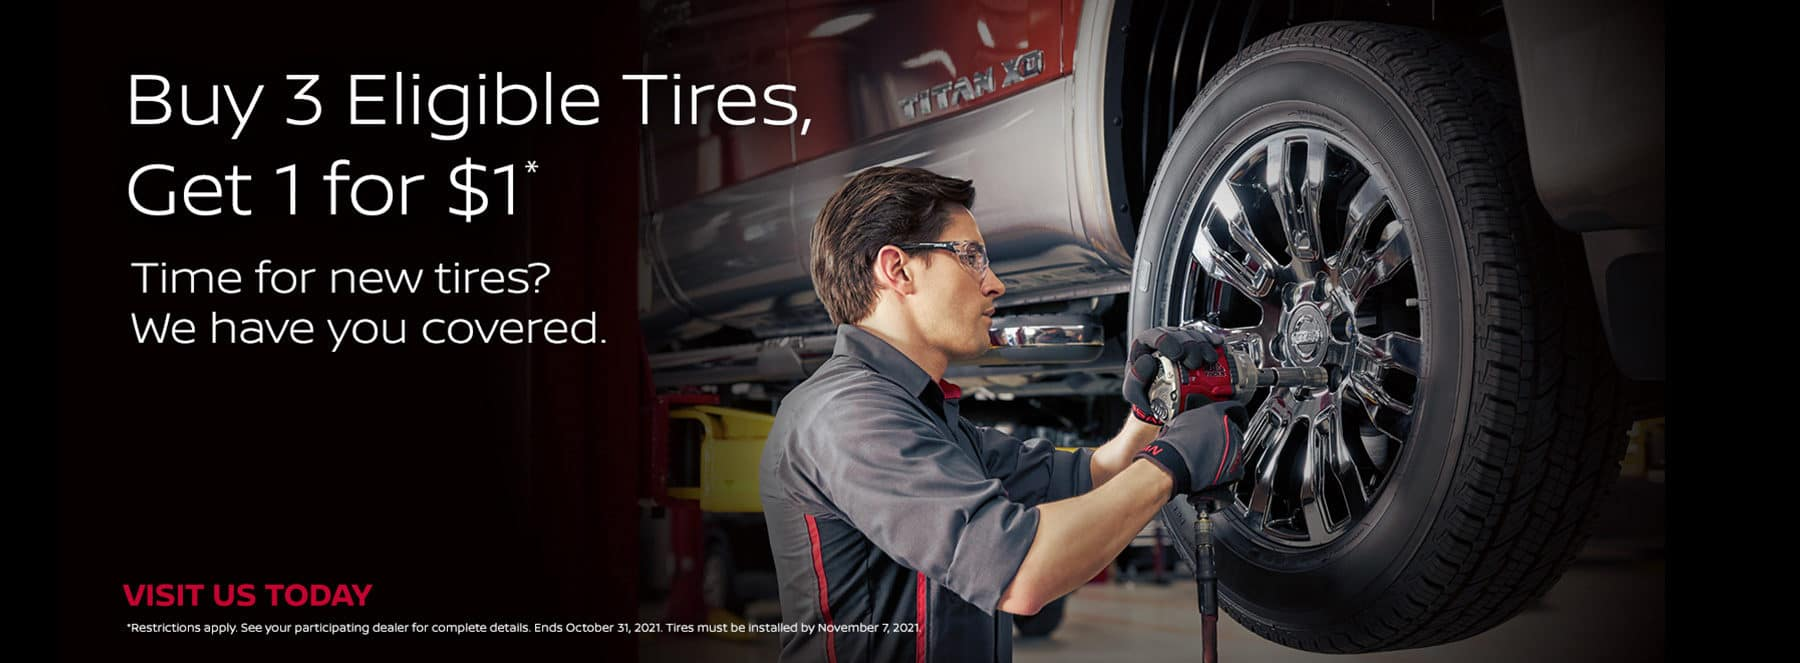 Garden Grove Nissan Buy 3 Get 1 Free Tire Offer